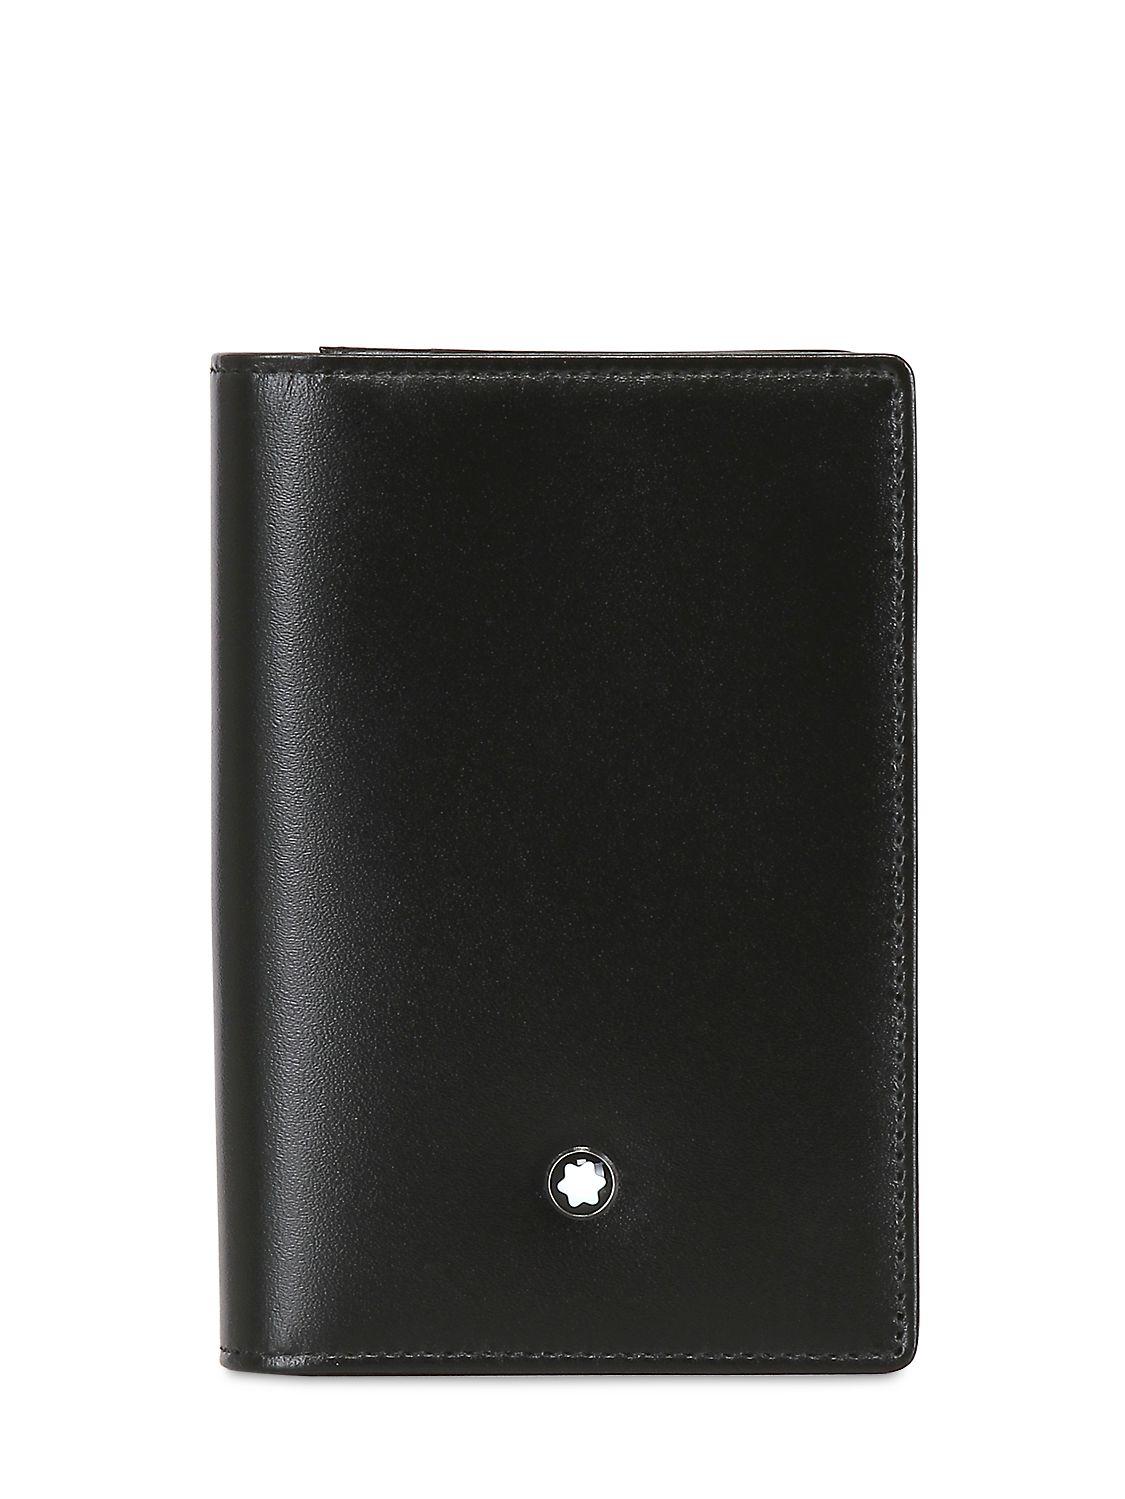 Montblanc Meisterstuck Business Card Holder in Black for